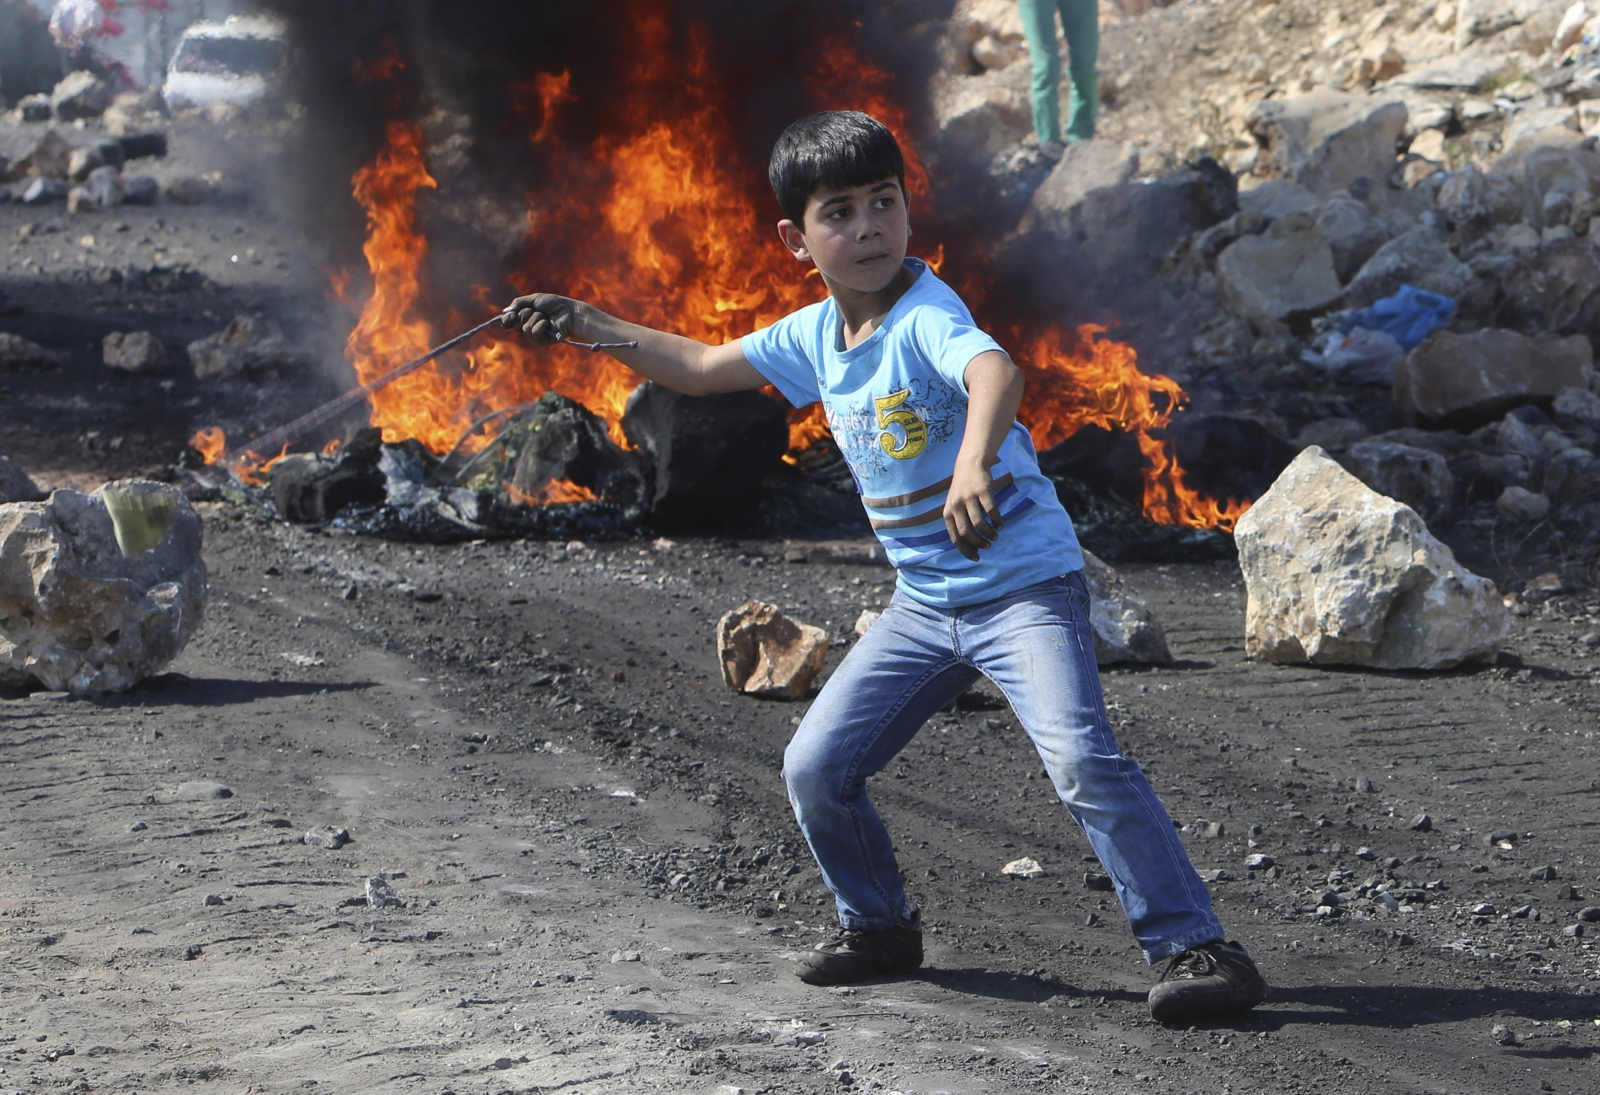 West Bank Clashes Orwah Hammad